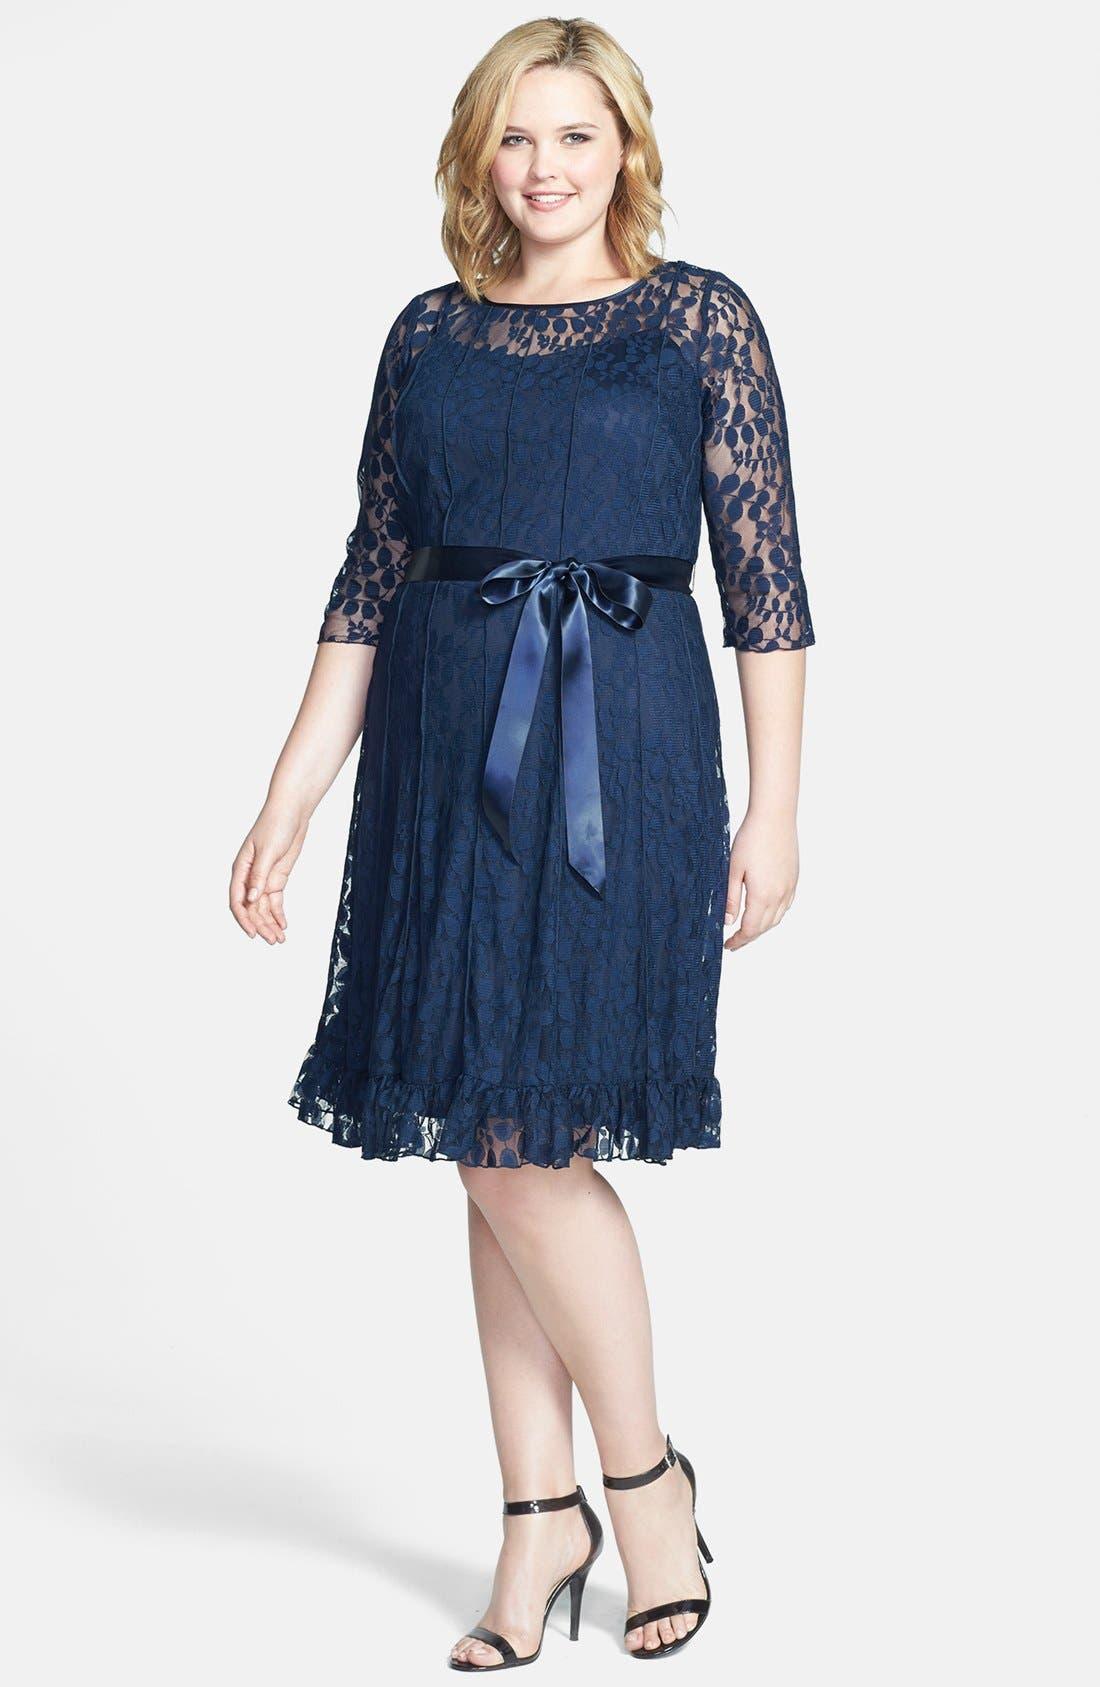 Alternate Image 1 Selected - Jessica Howard Lace Dress (Plus Size)